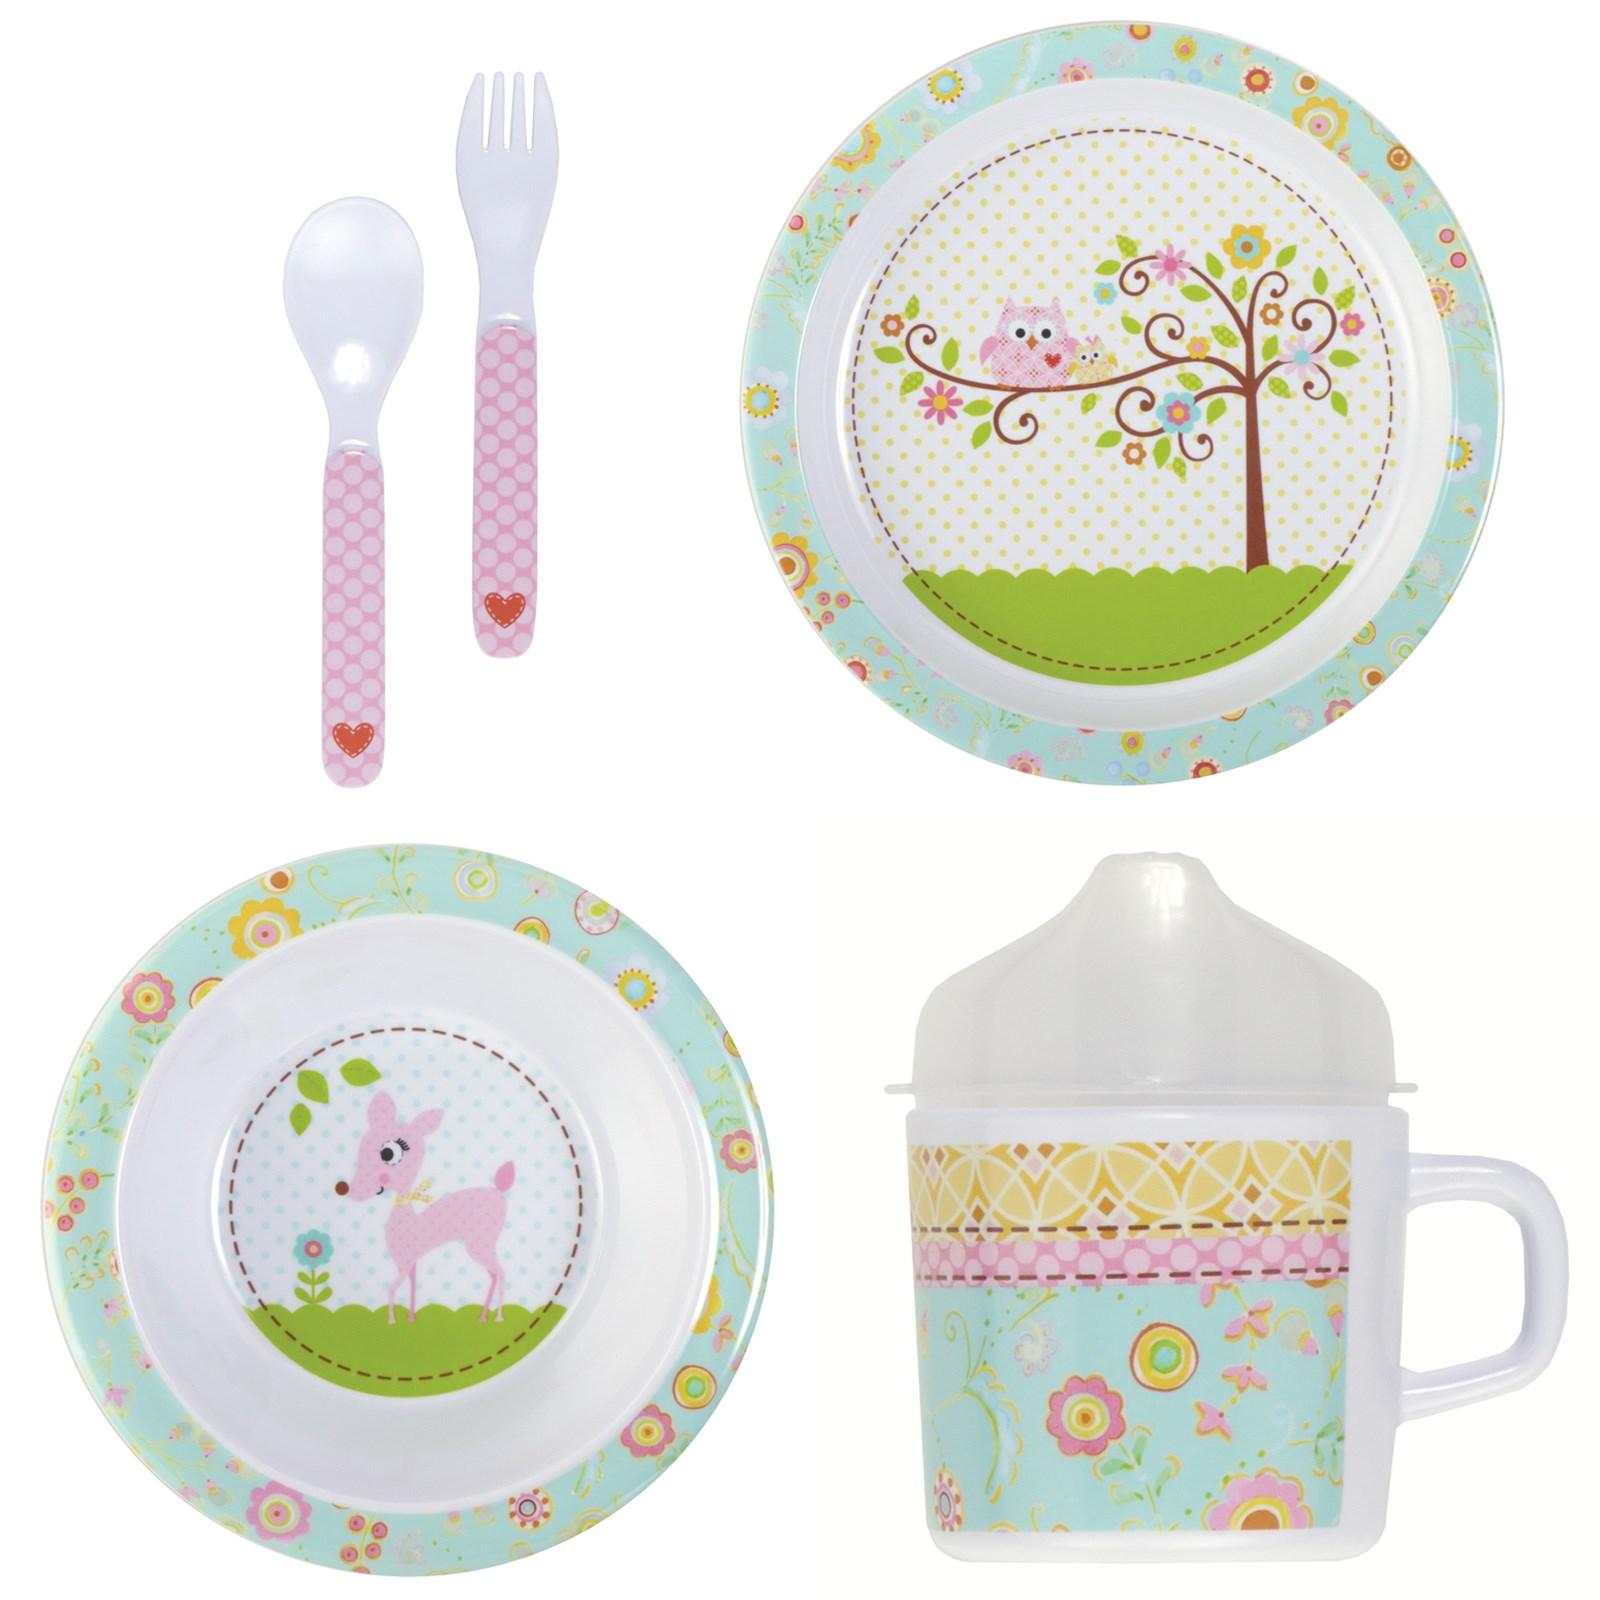 Image of Happy Baby Girl Melamine Dinnerware Set